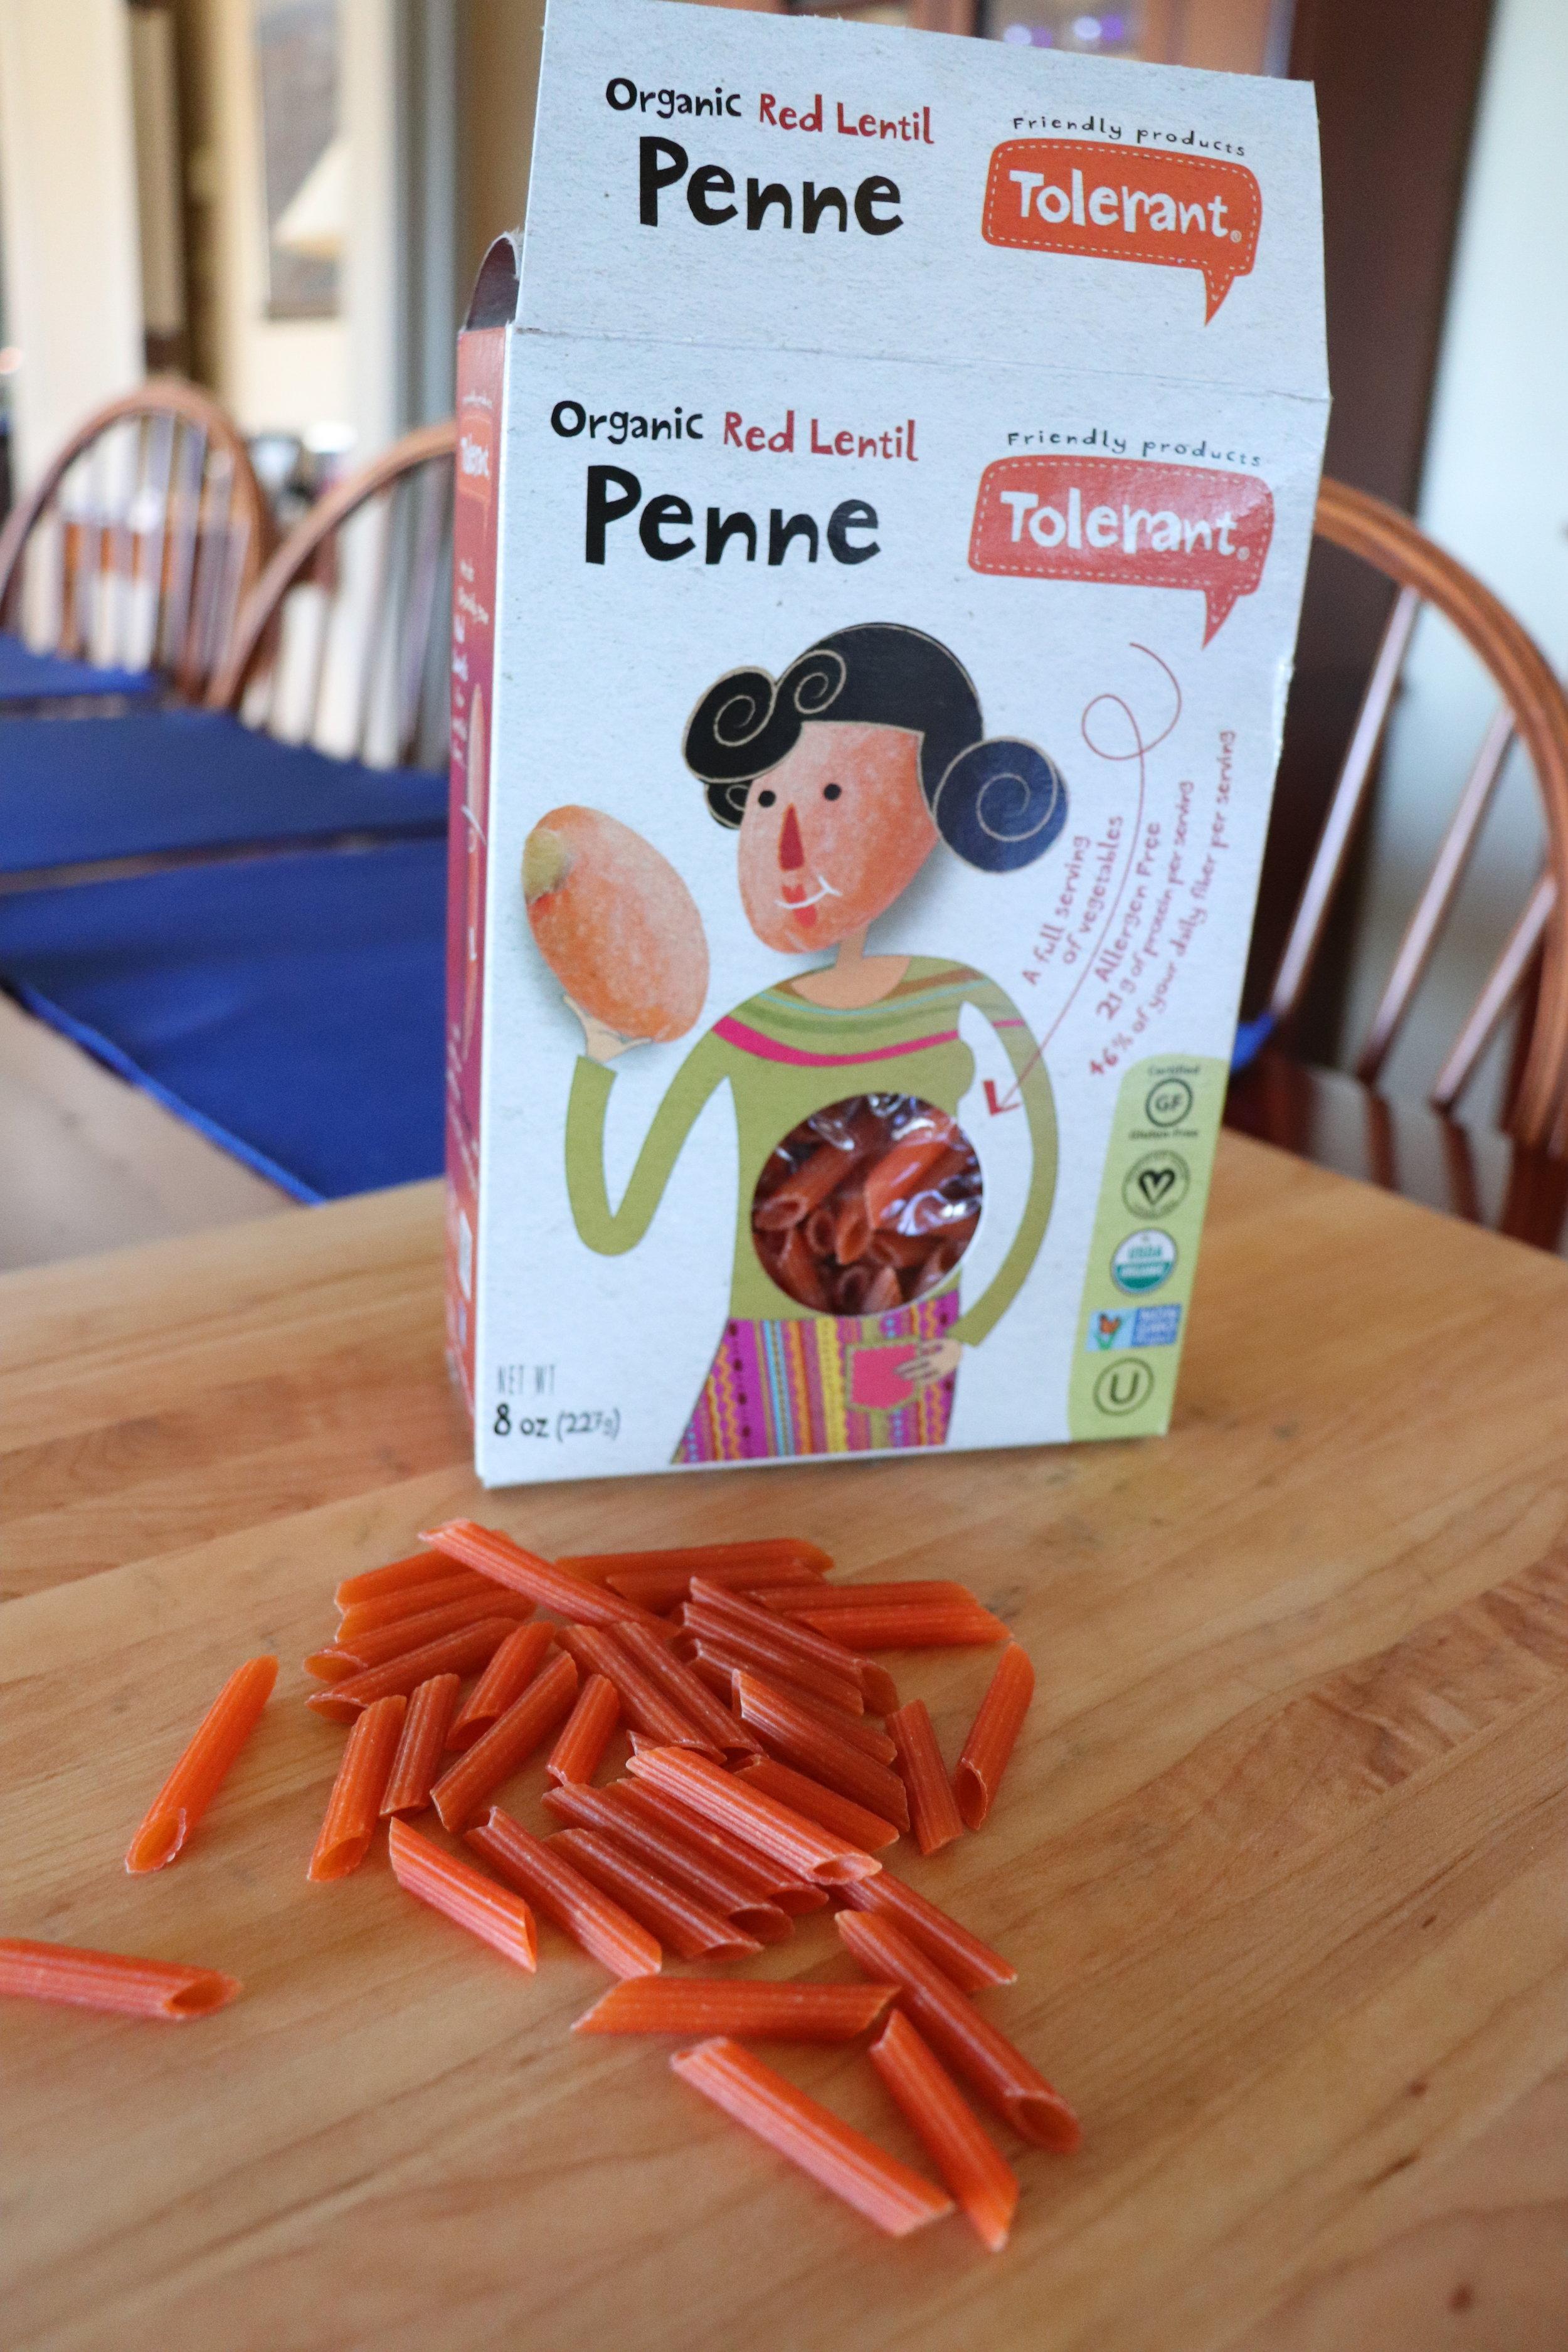 My gluten-free pasta vote goes to red lentil.